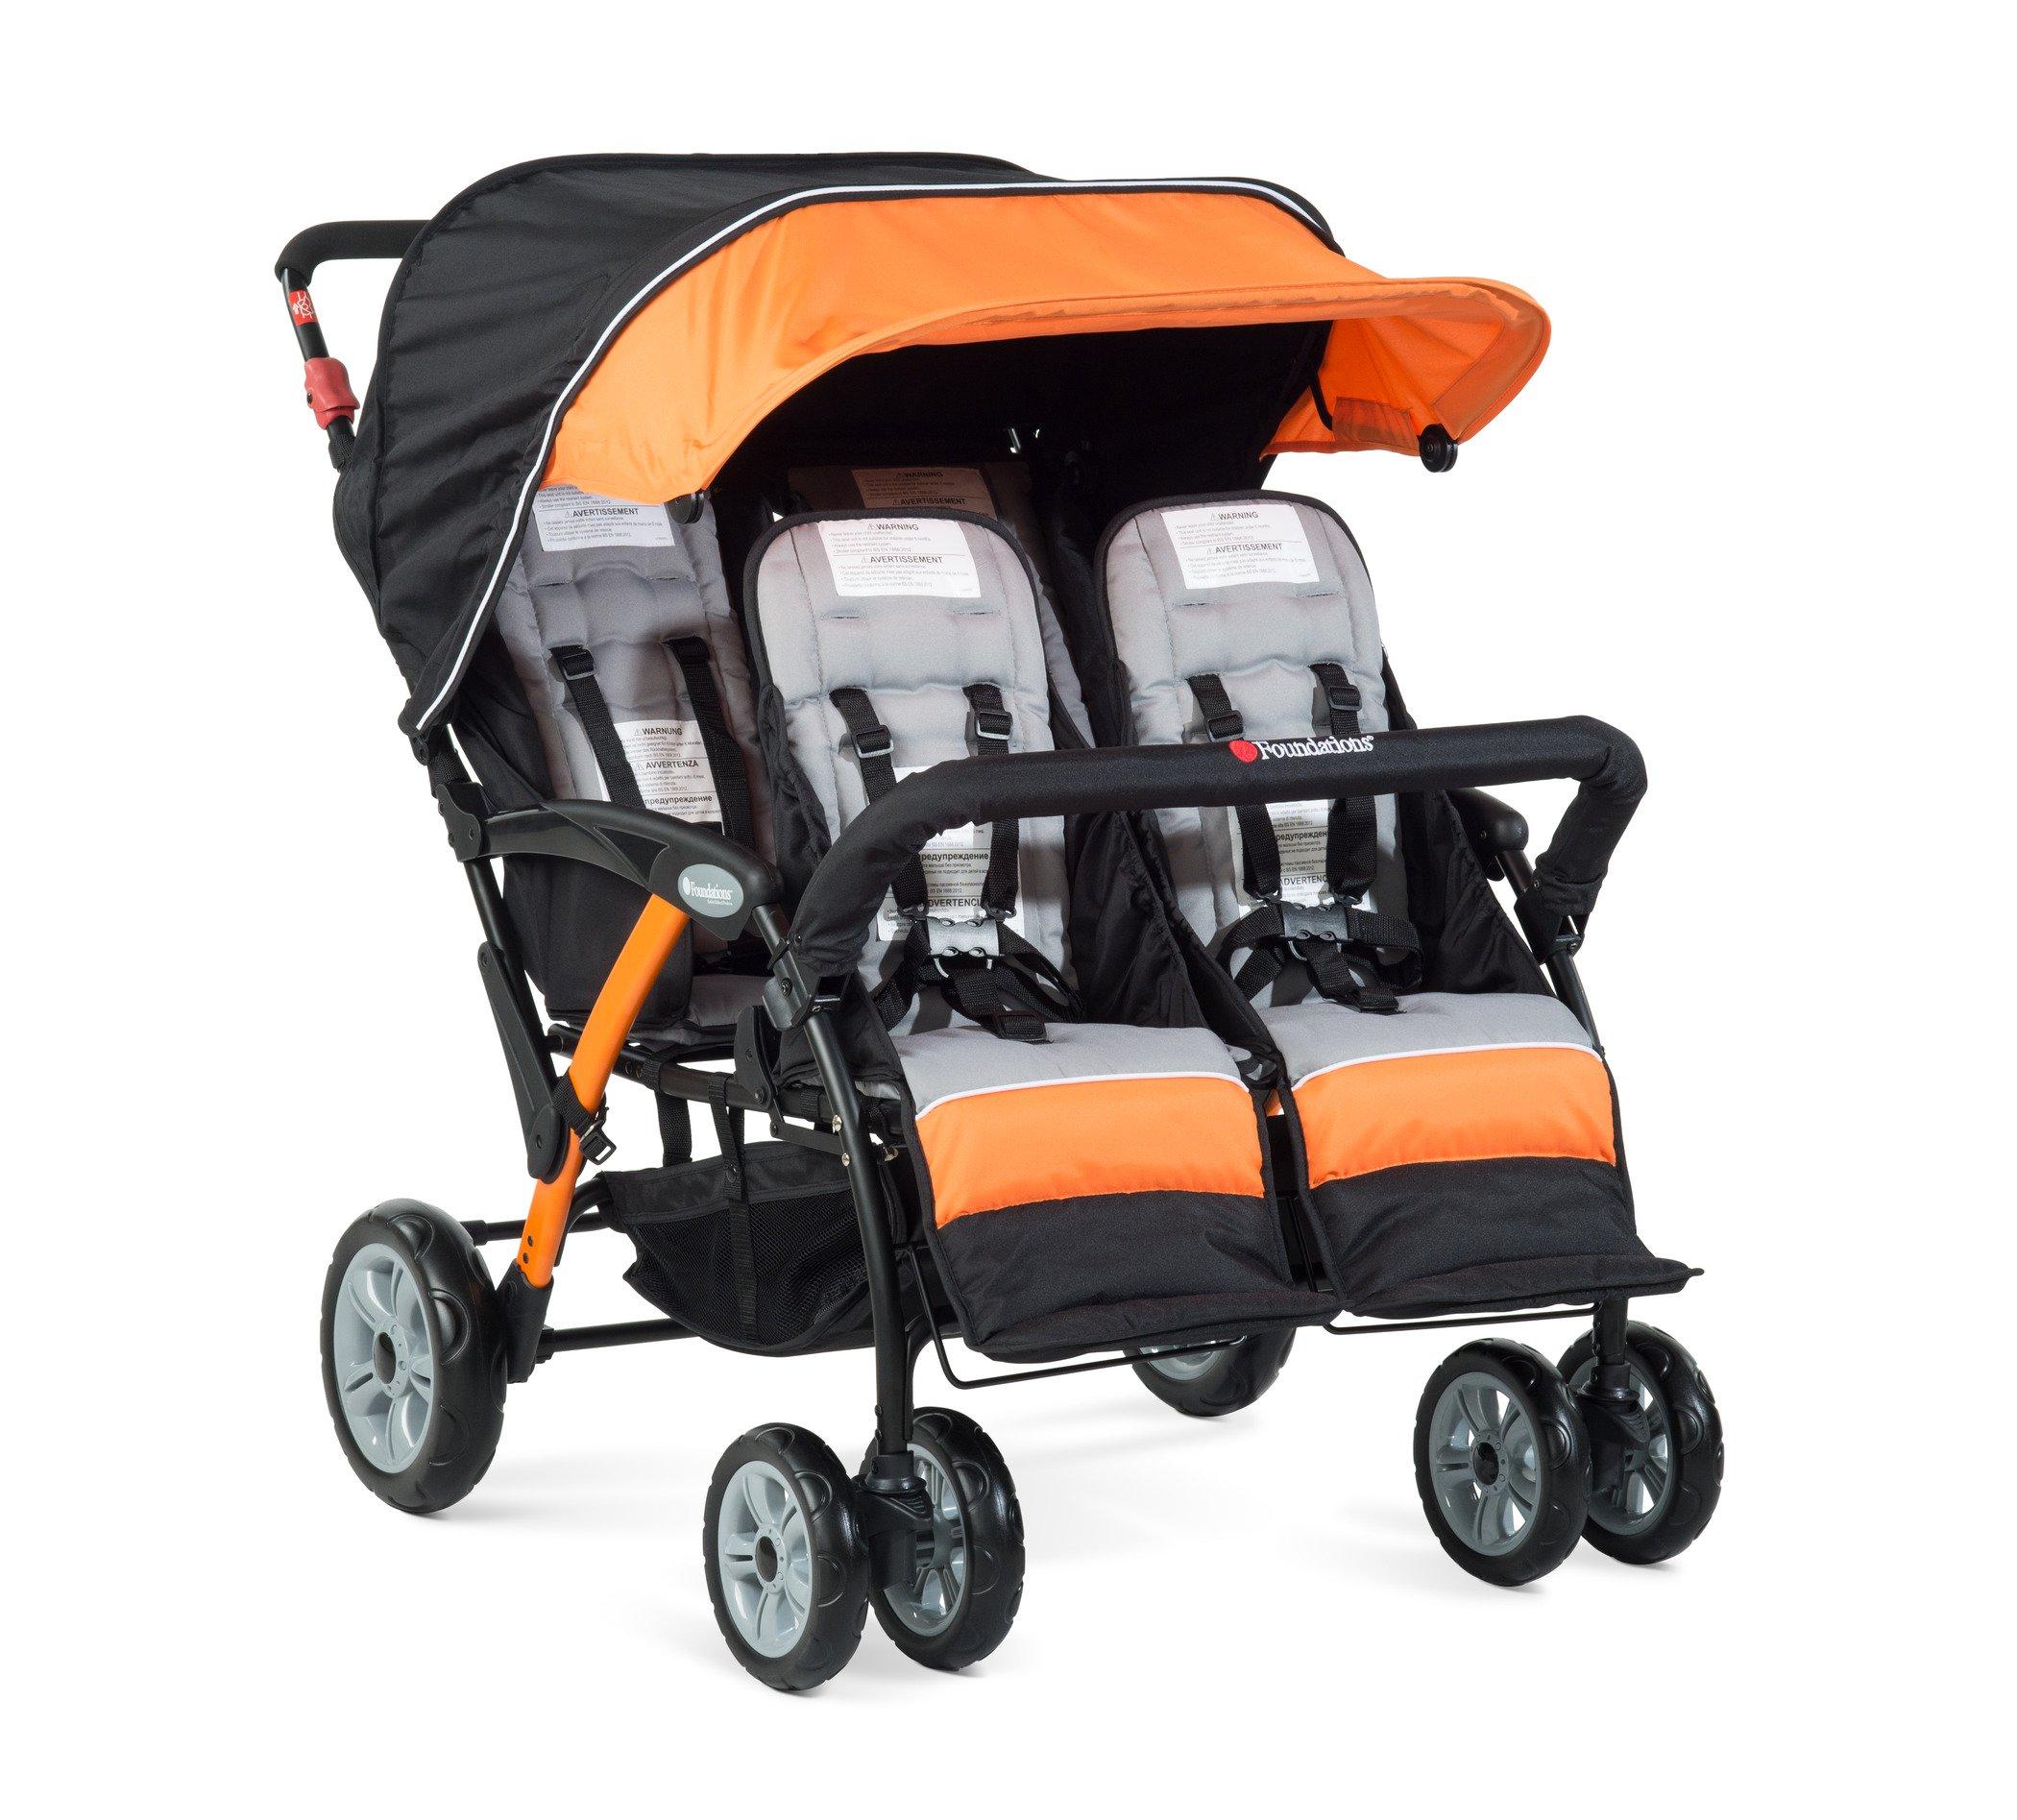 Foundations Quad Sport 4 Passenger Stroller, Orange